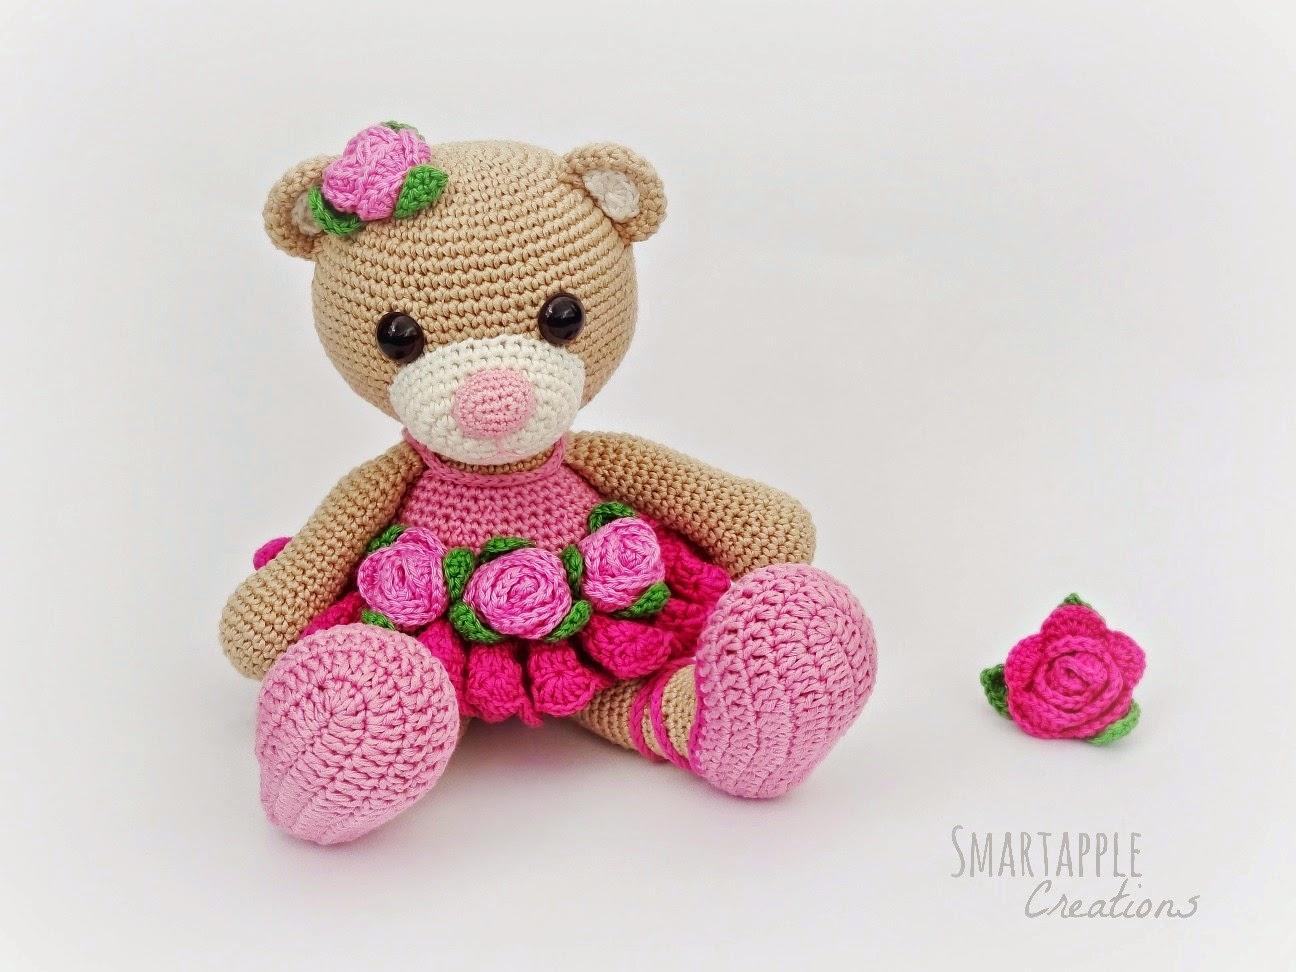 Ballerina doll amigurumi crochet pattern - Amigu World   972x1296